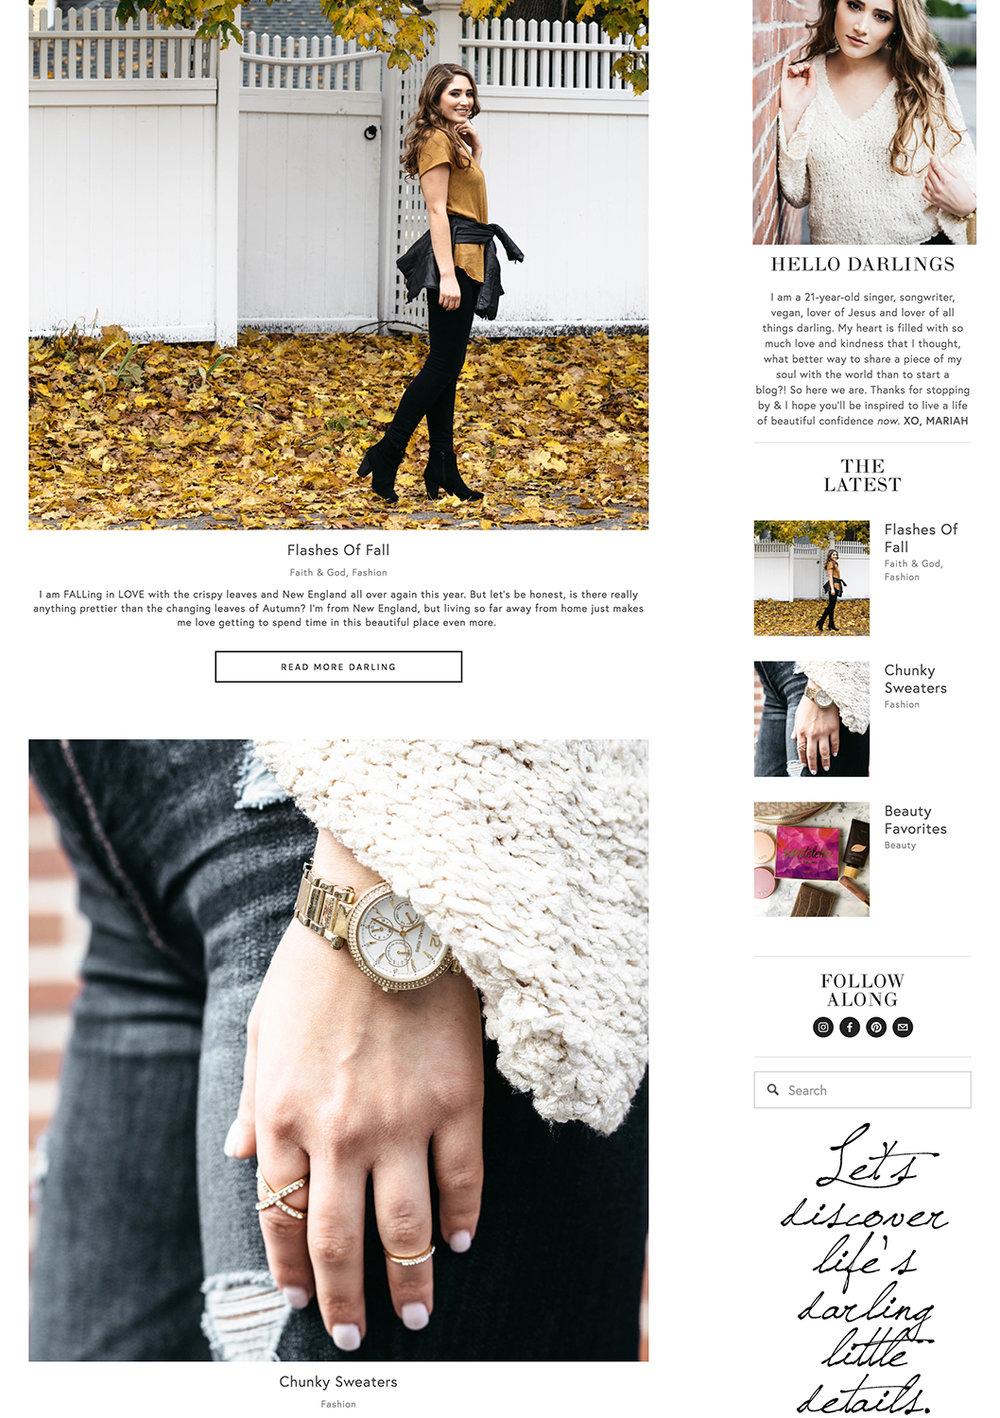 @mariahgracecaruso - BloggerFaith +Lifestyle Blog